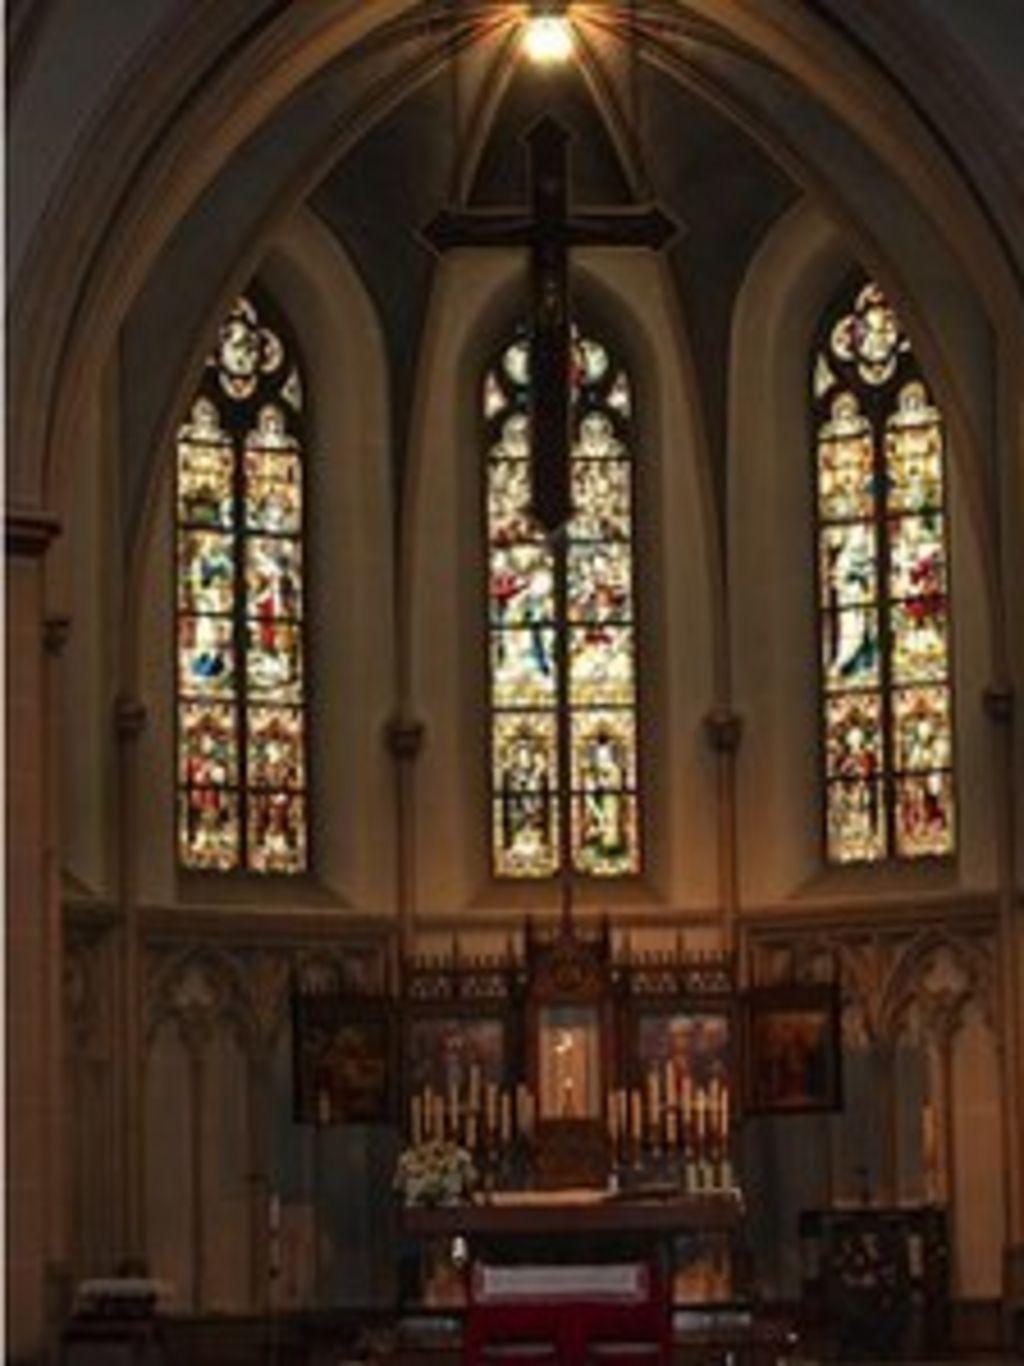 German Catholics face tax threat